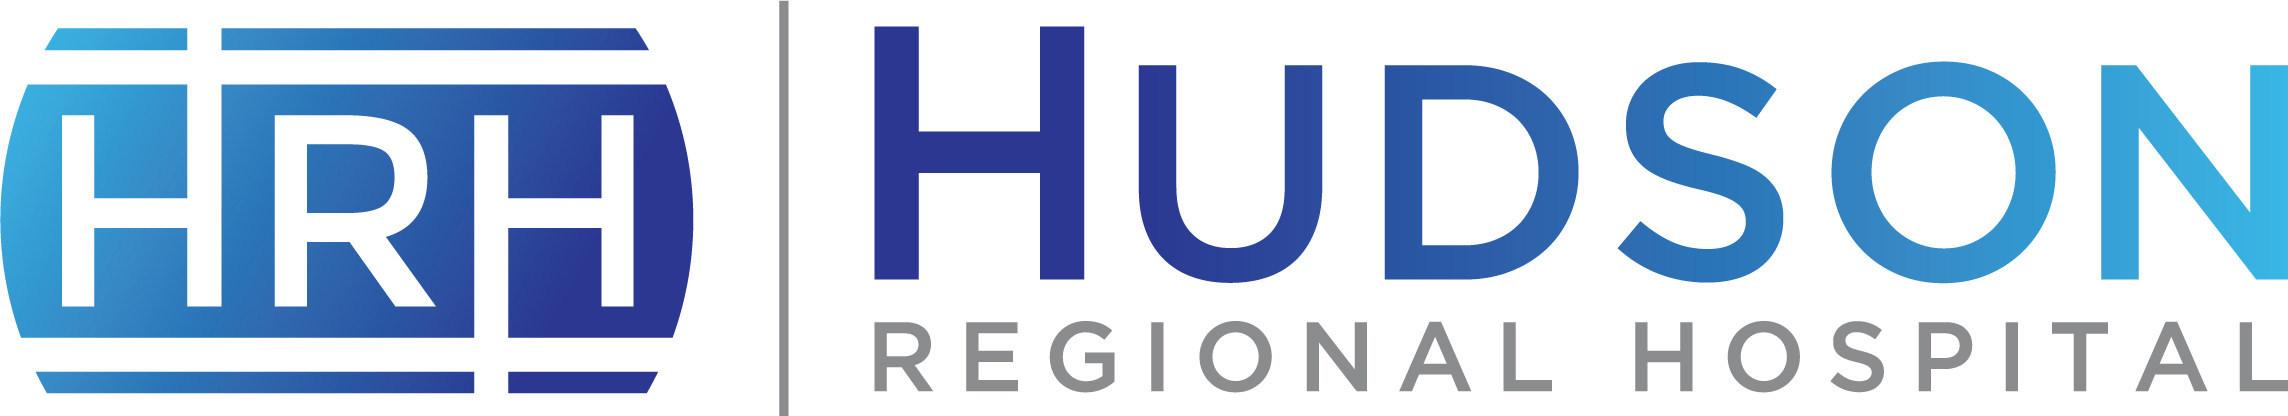 Hudson Regional Hospital Logo - http://www.hudsonregionalhospital.com/contact/